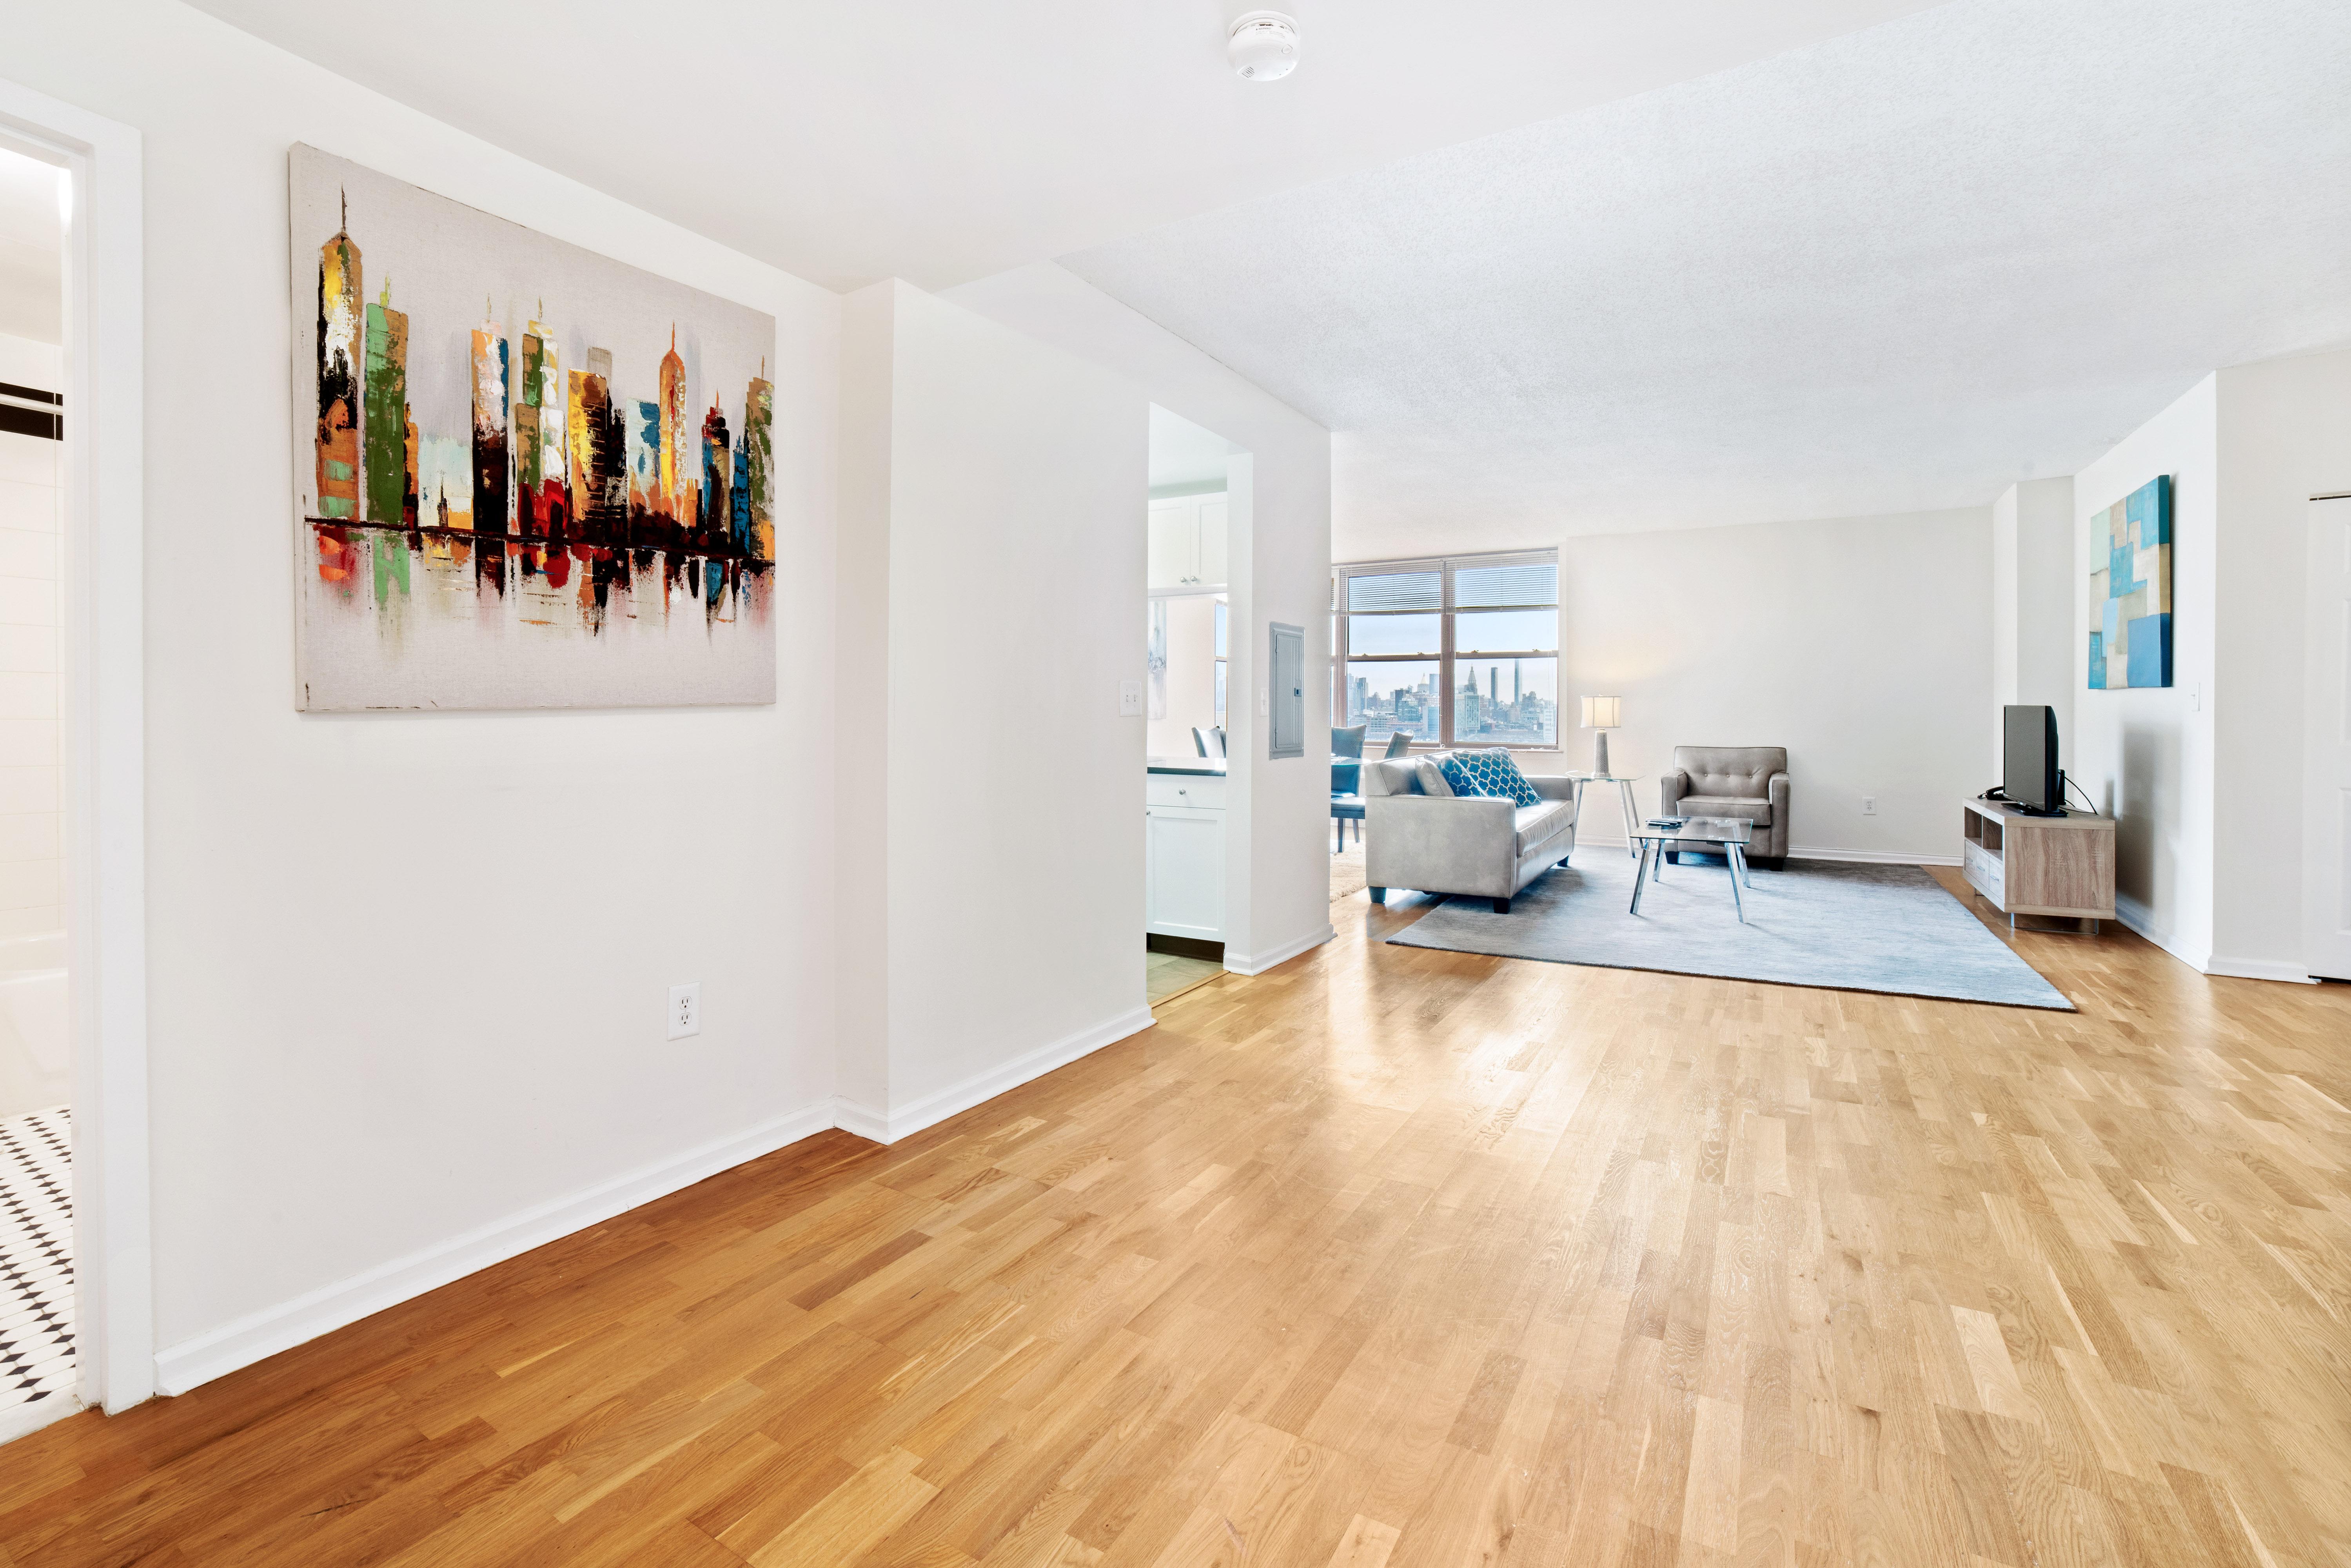 image 2 furnished 1 bedroom Apartment for rent in Hoboken, Hudson County